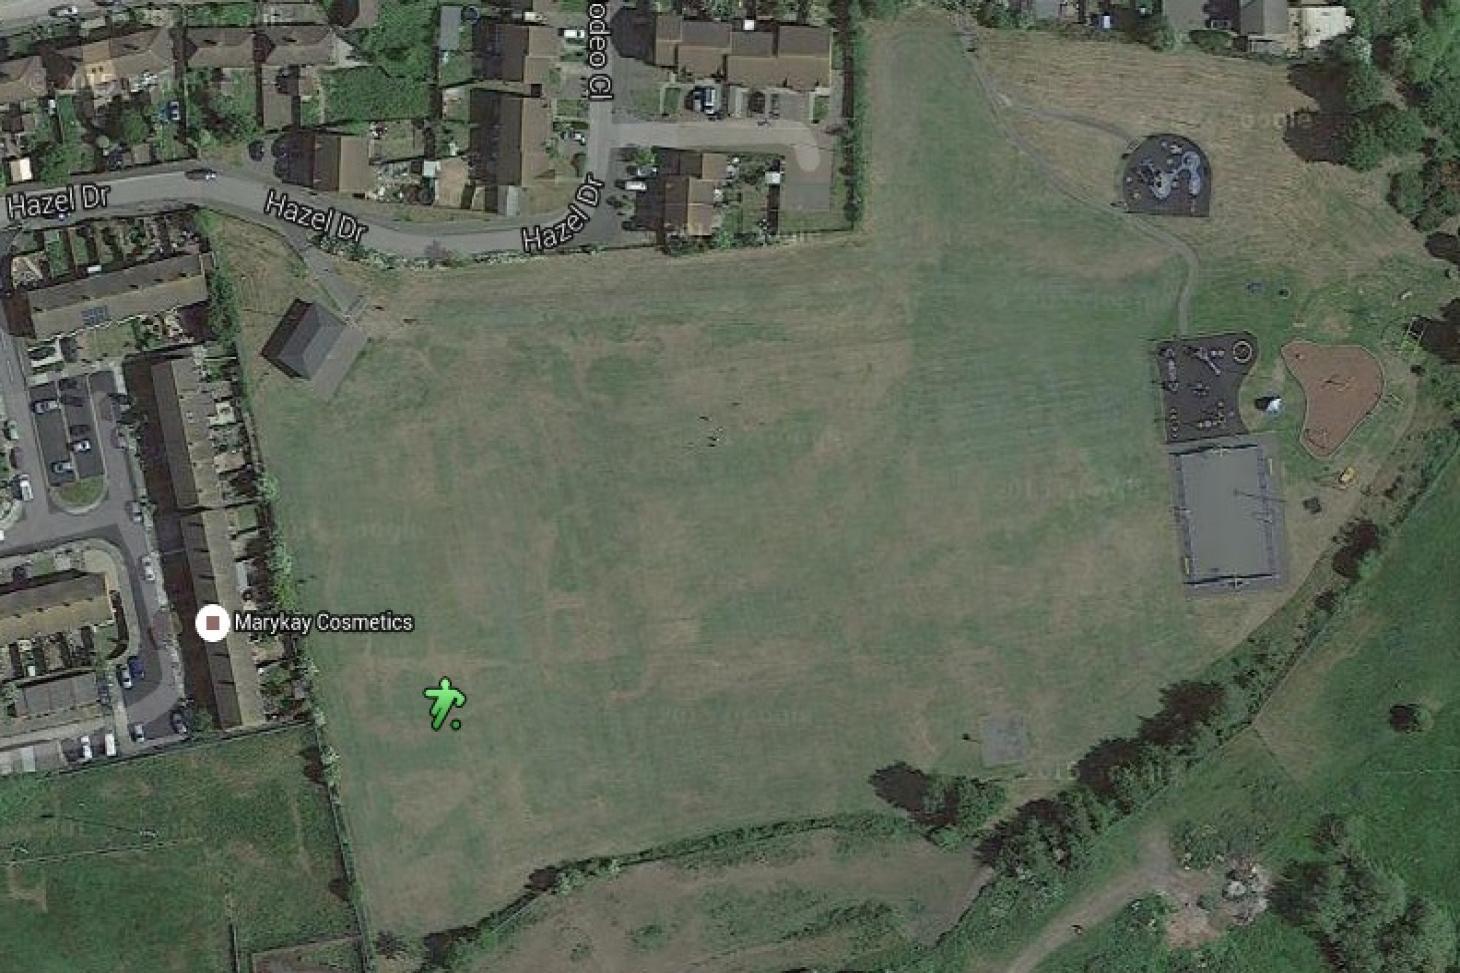 Slade Green Recreation Ground 11 a side | Grass football pitch